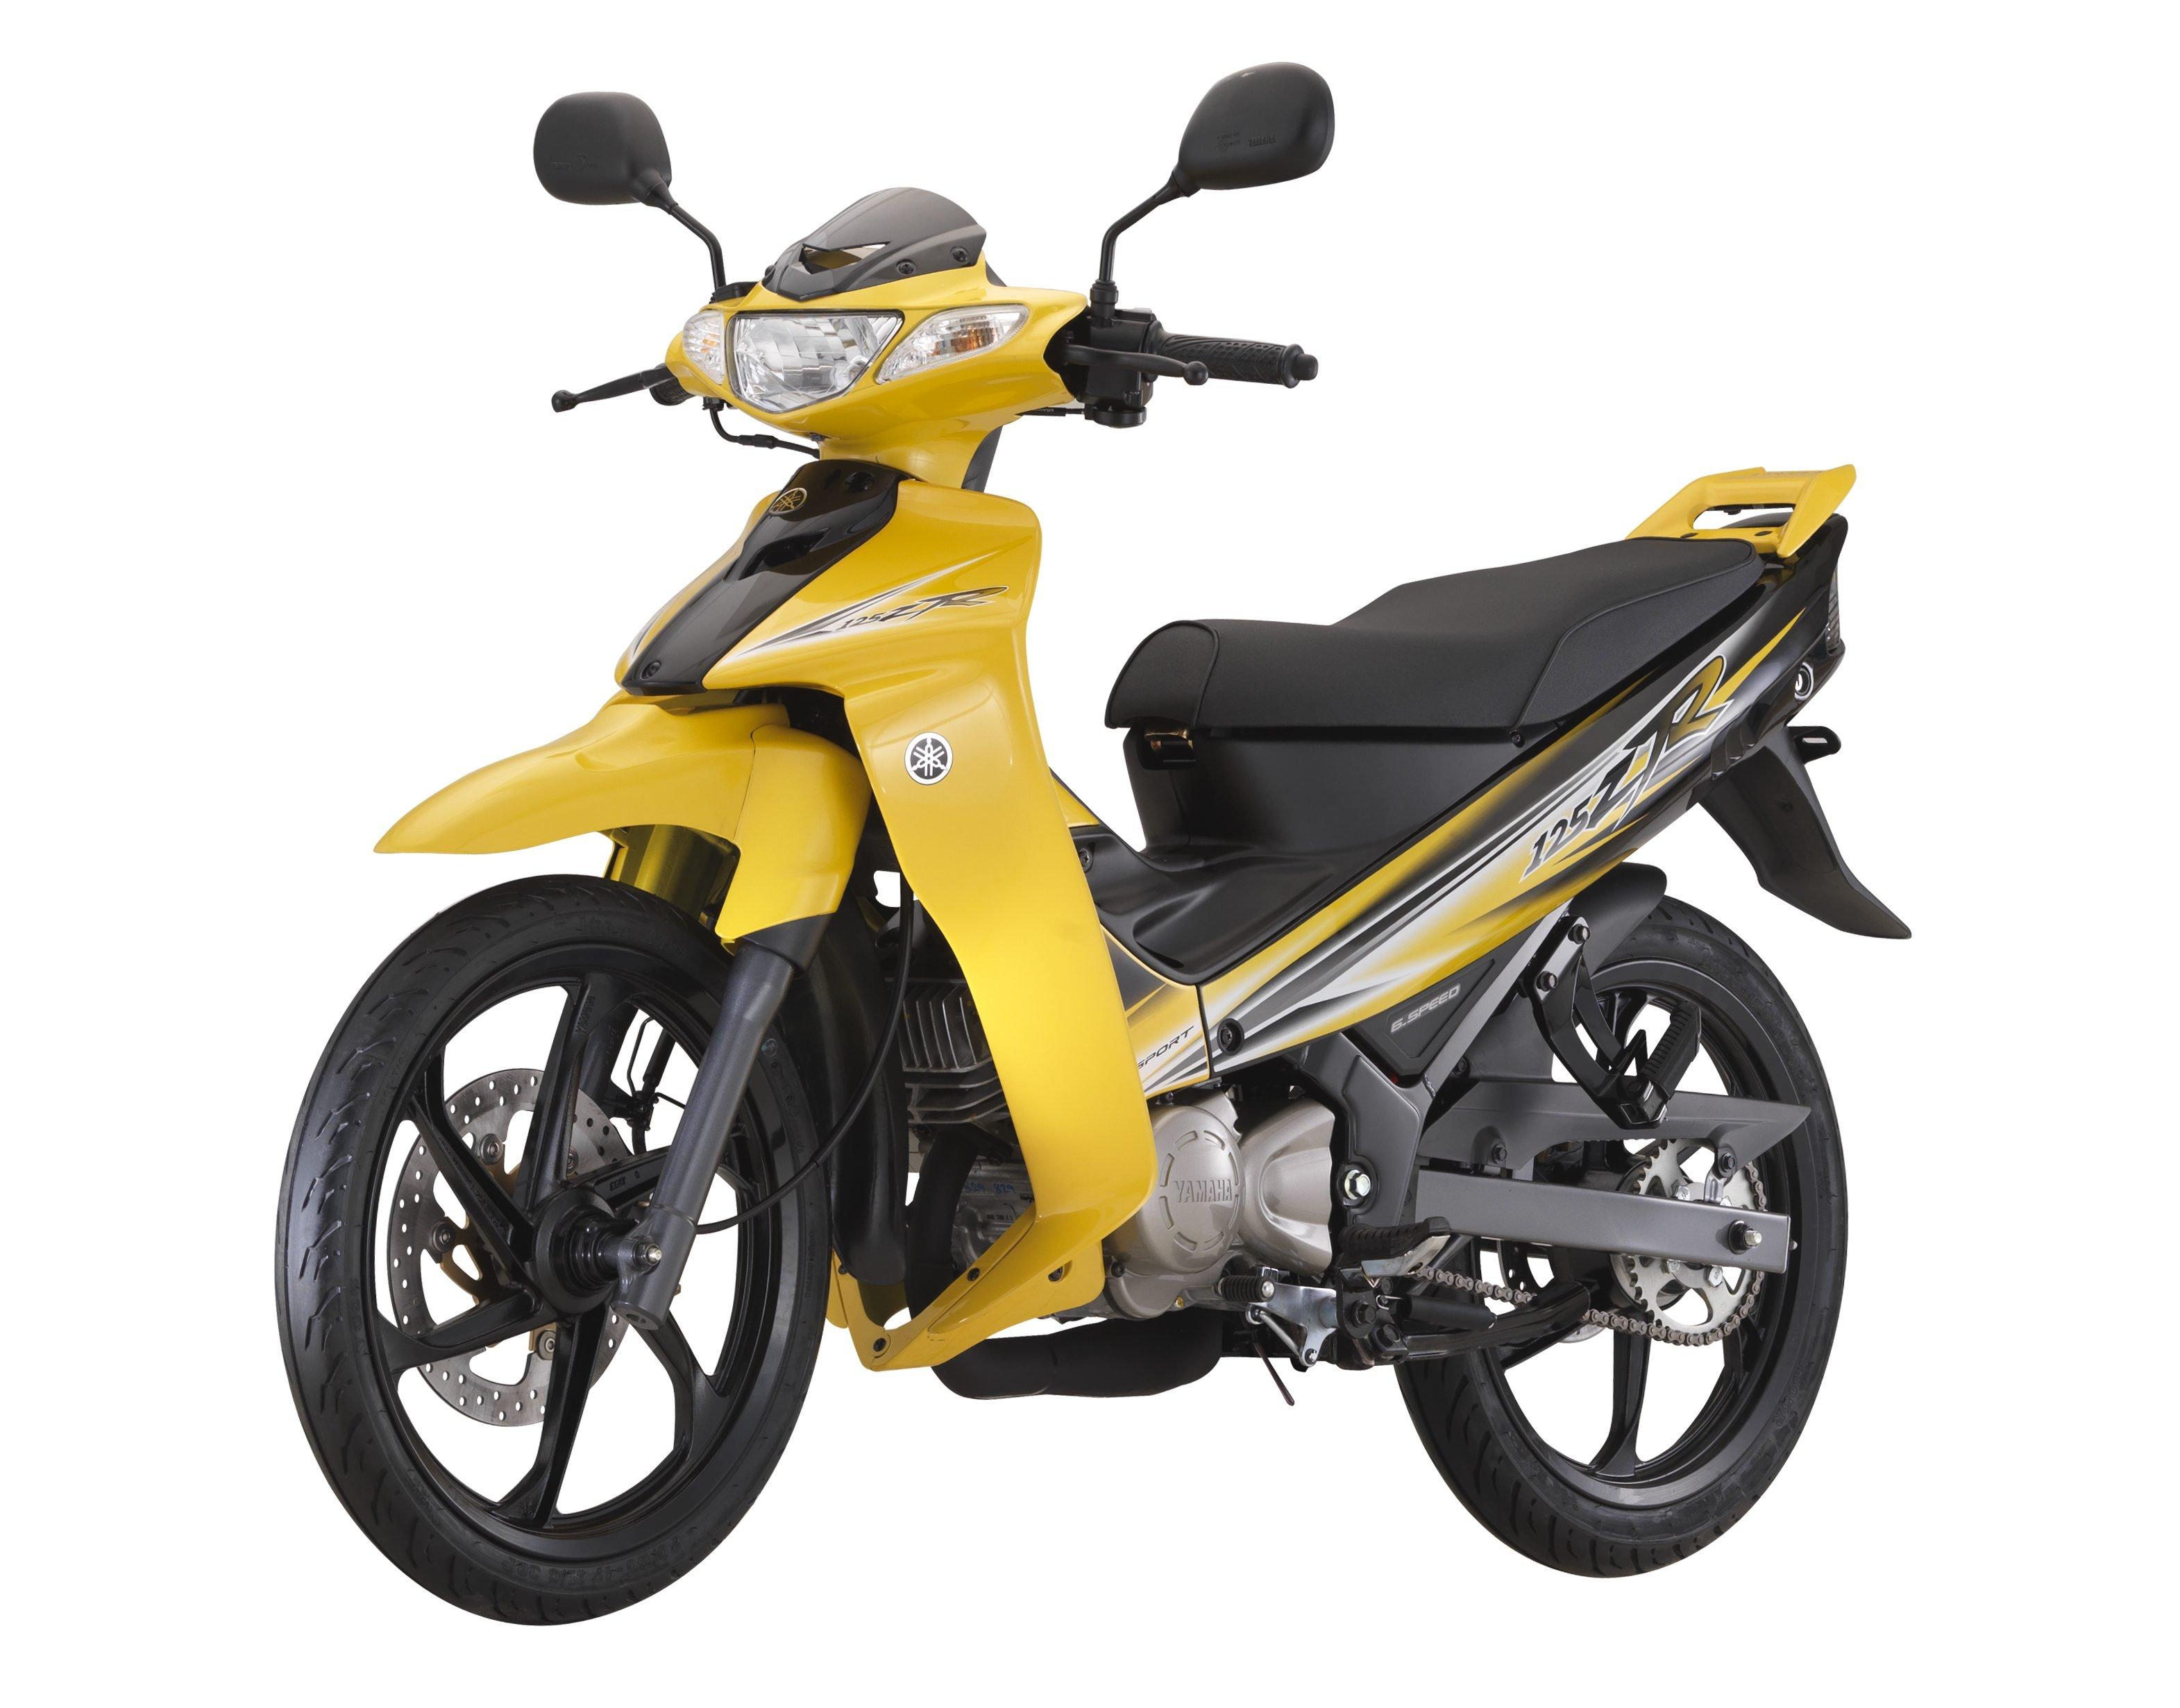 Yamaha Zr Motorcycle